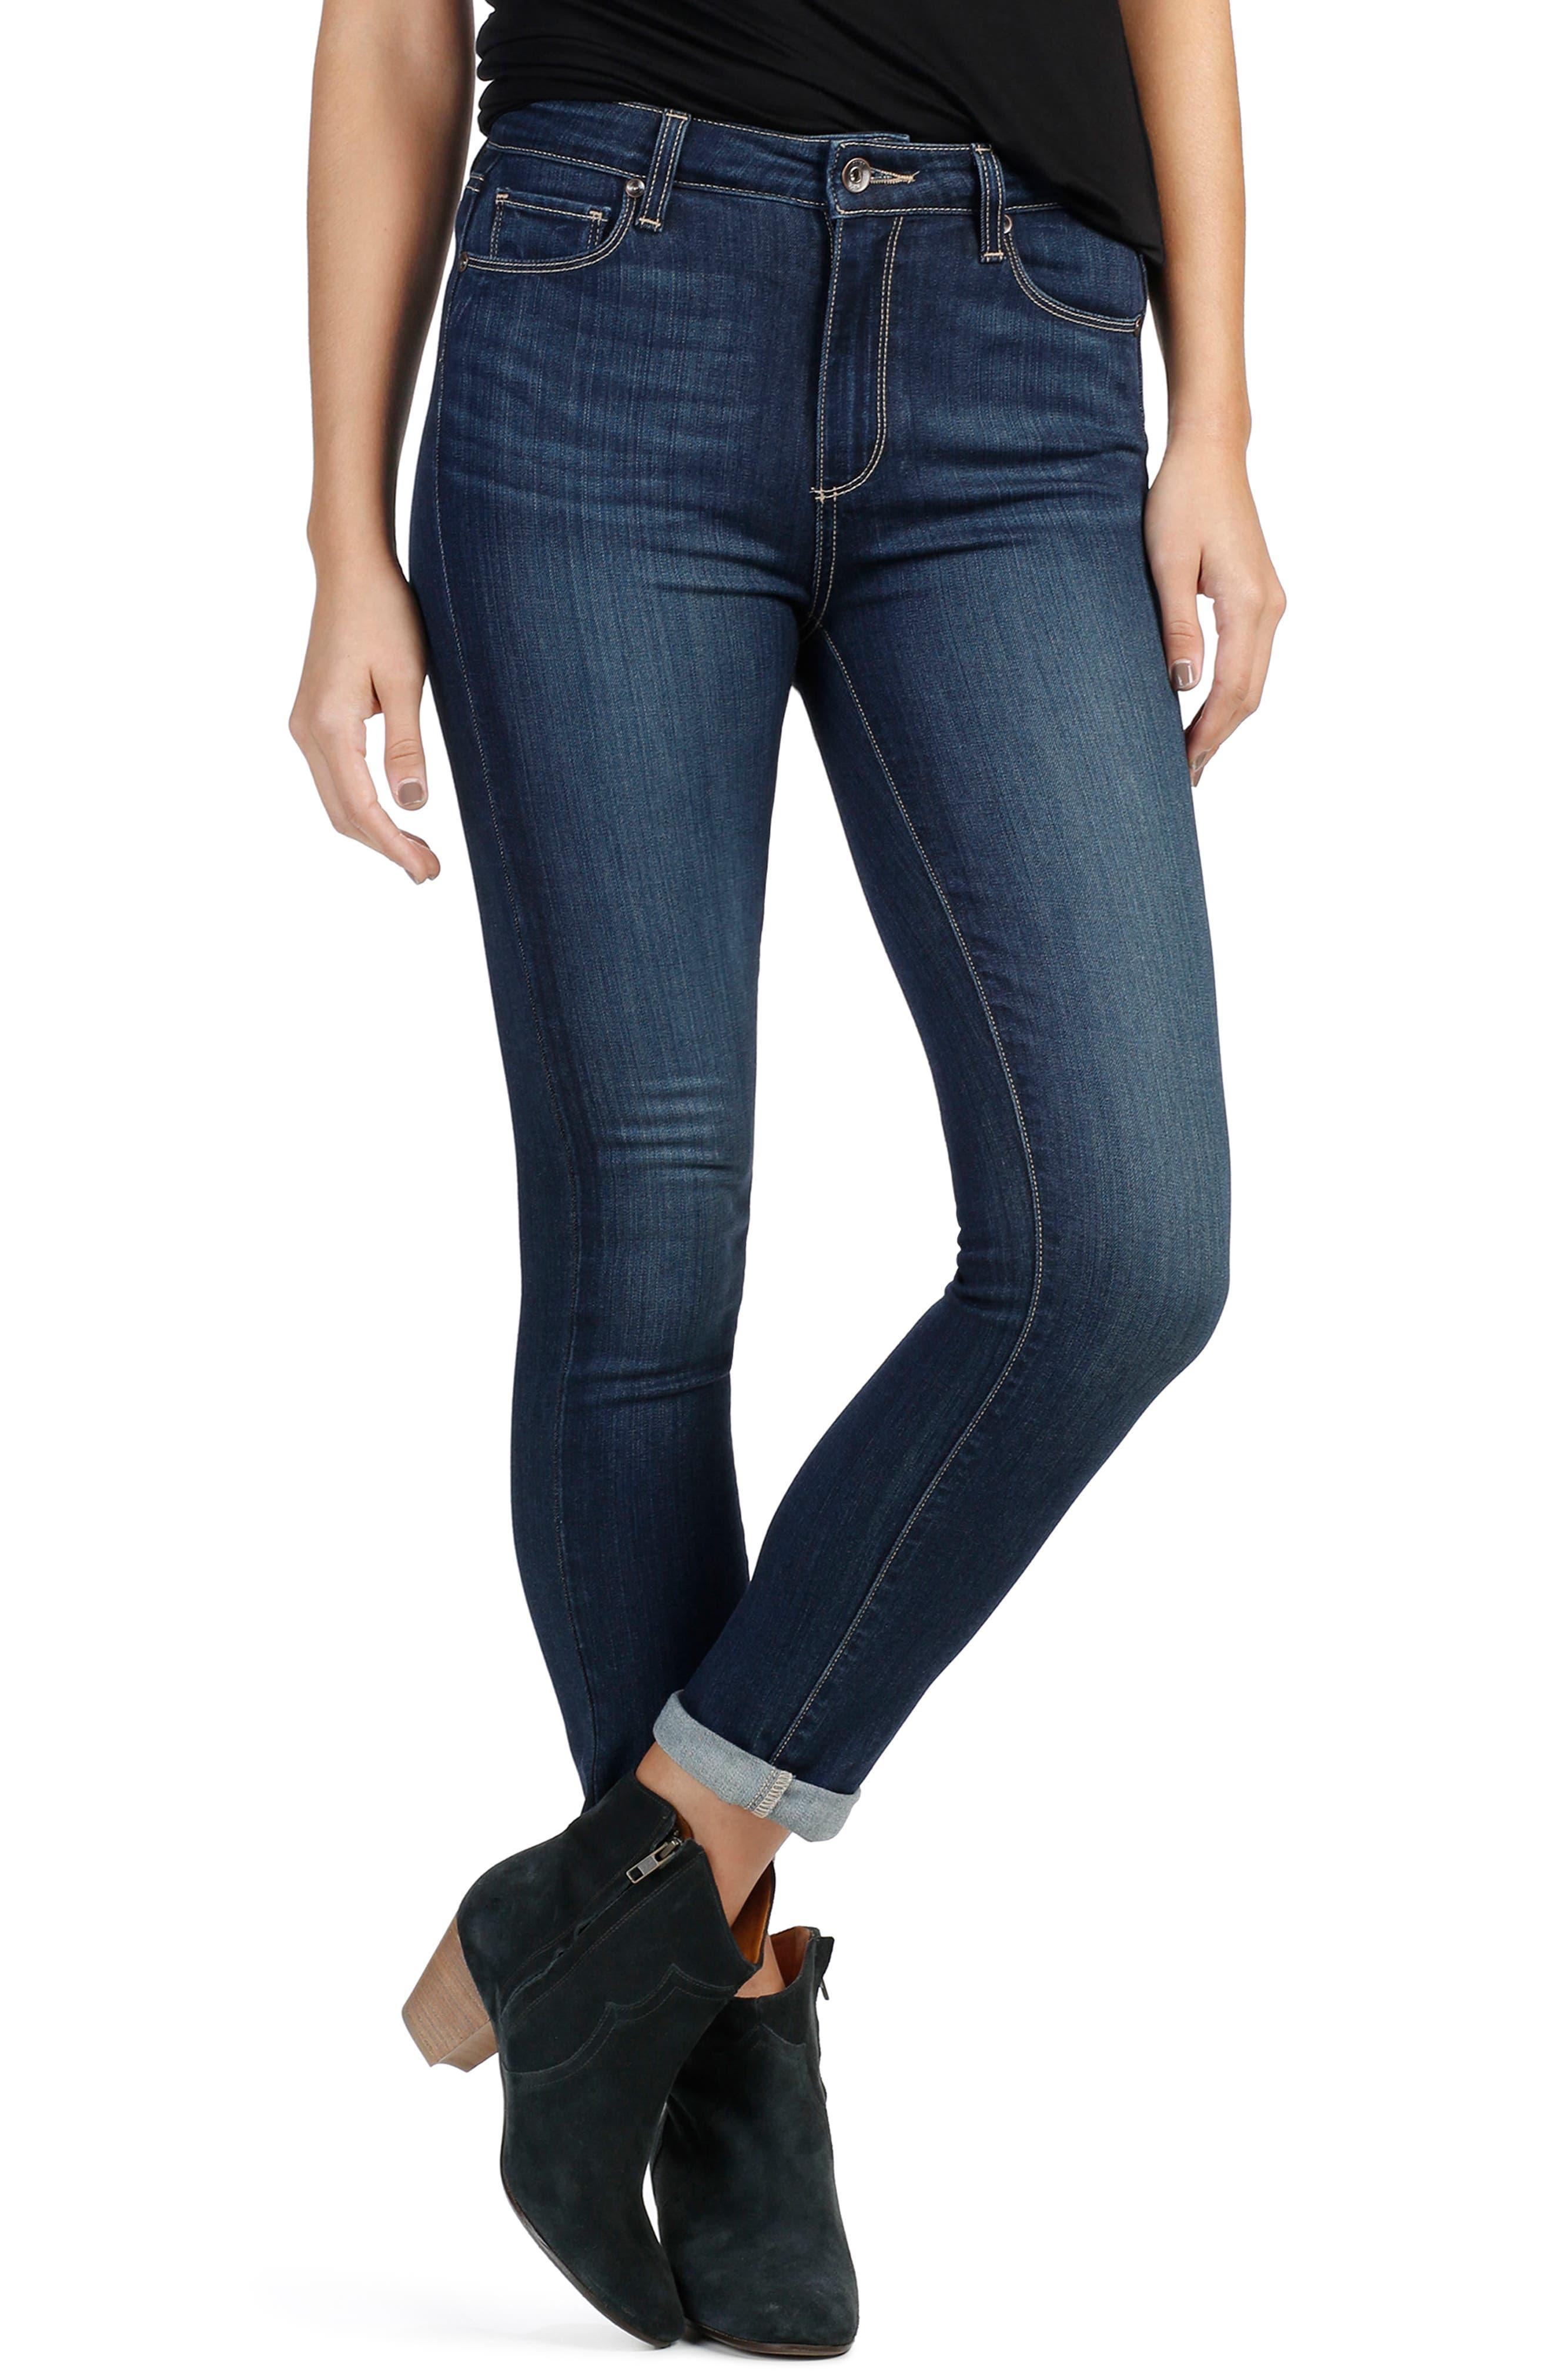 Transcend - Hoxton High Waist Crop Skinny Jeans,                             Main thumbnail 1, color,                             400